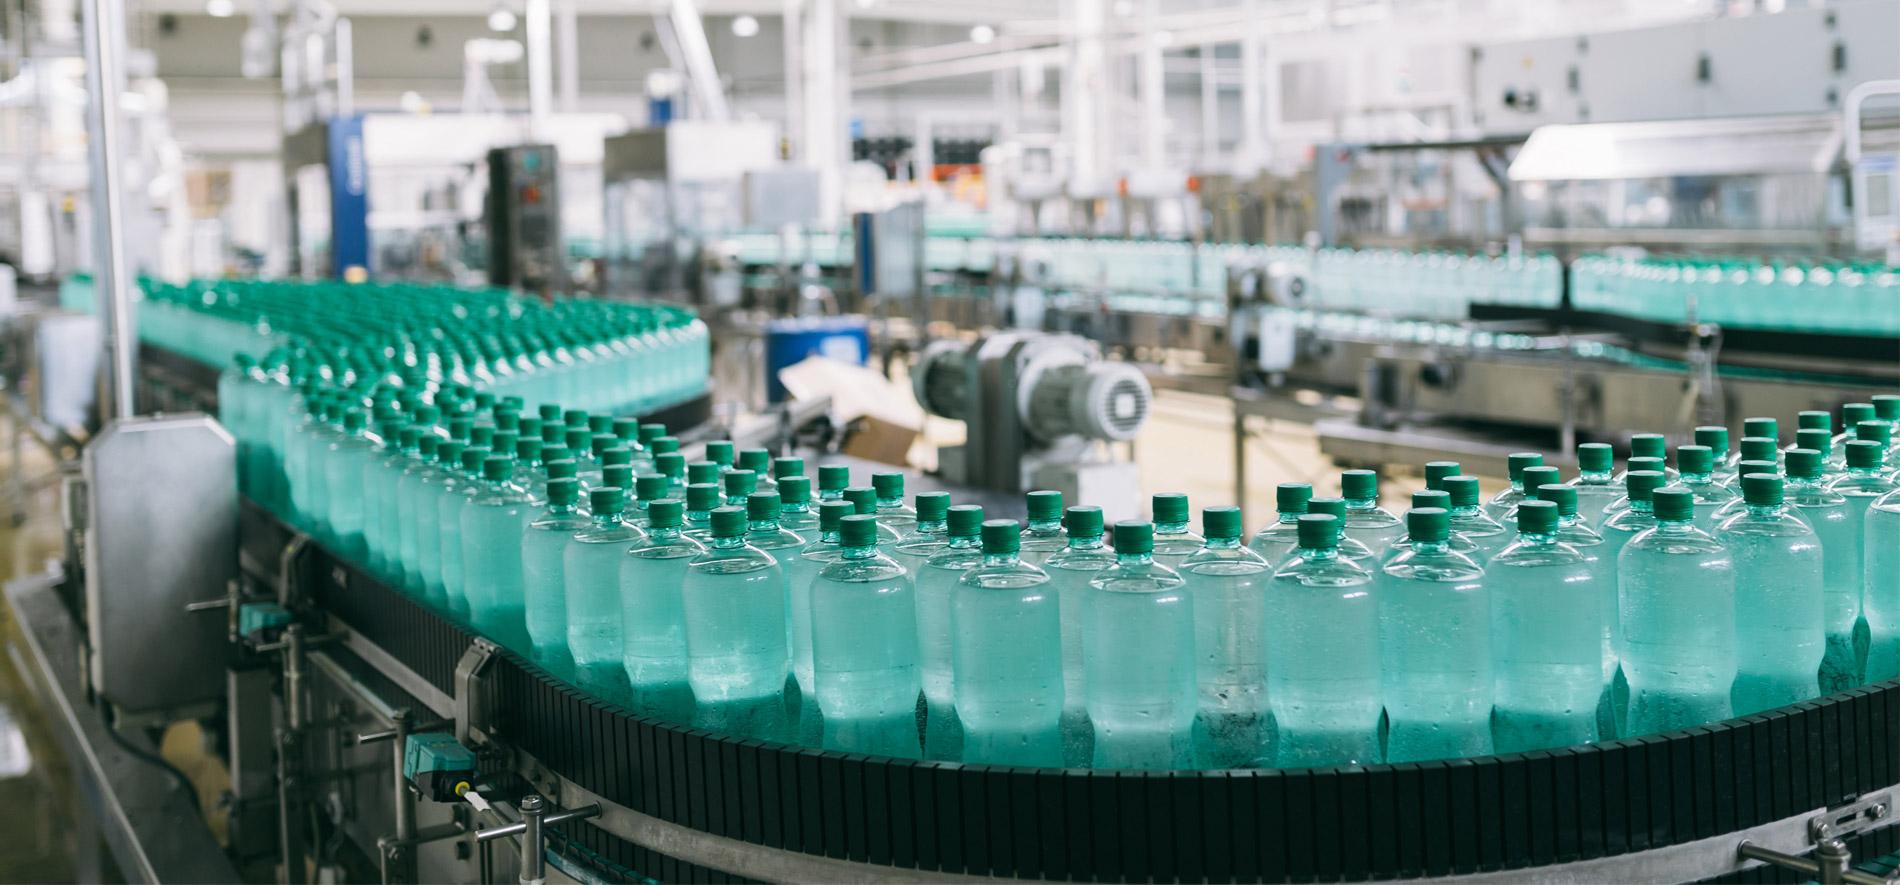 Engineering with bioplastics | Cambridge Consultants